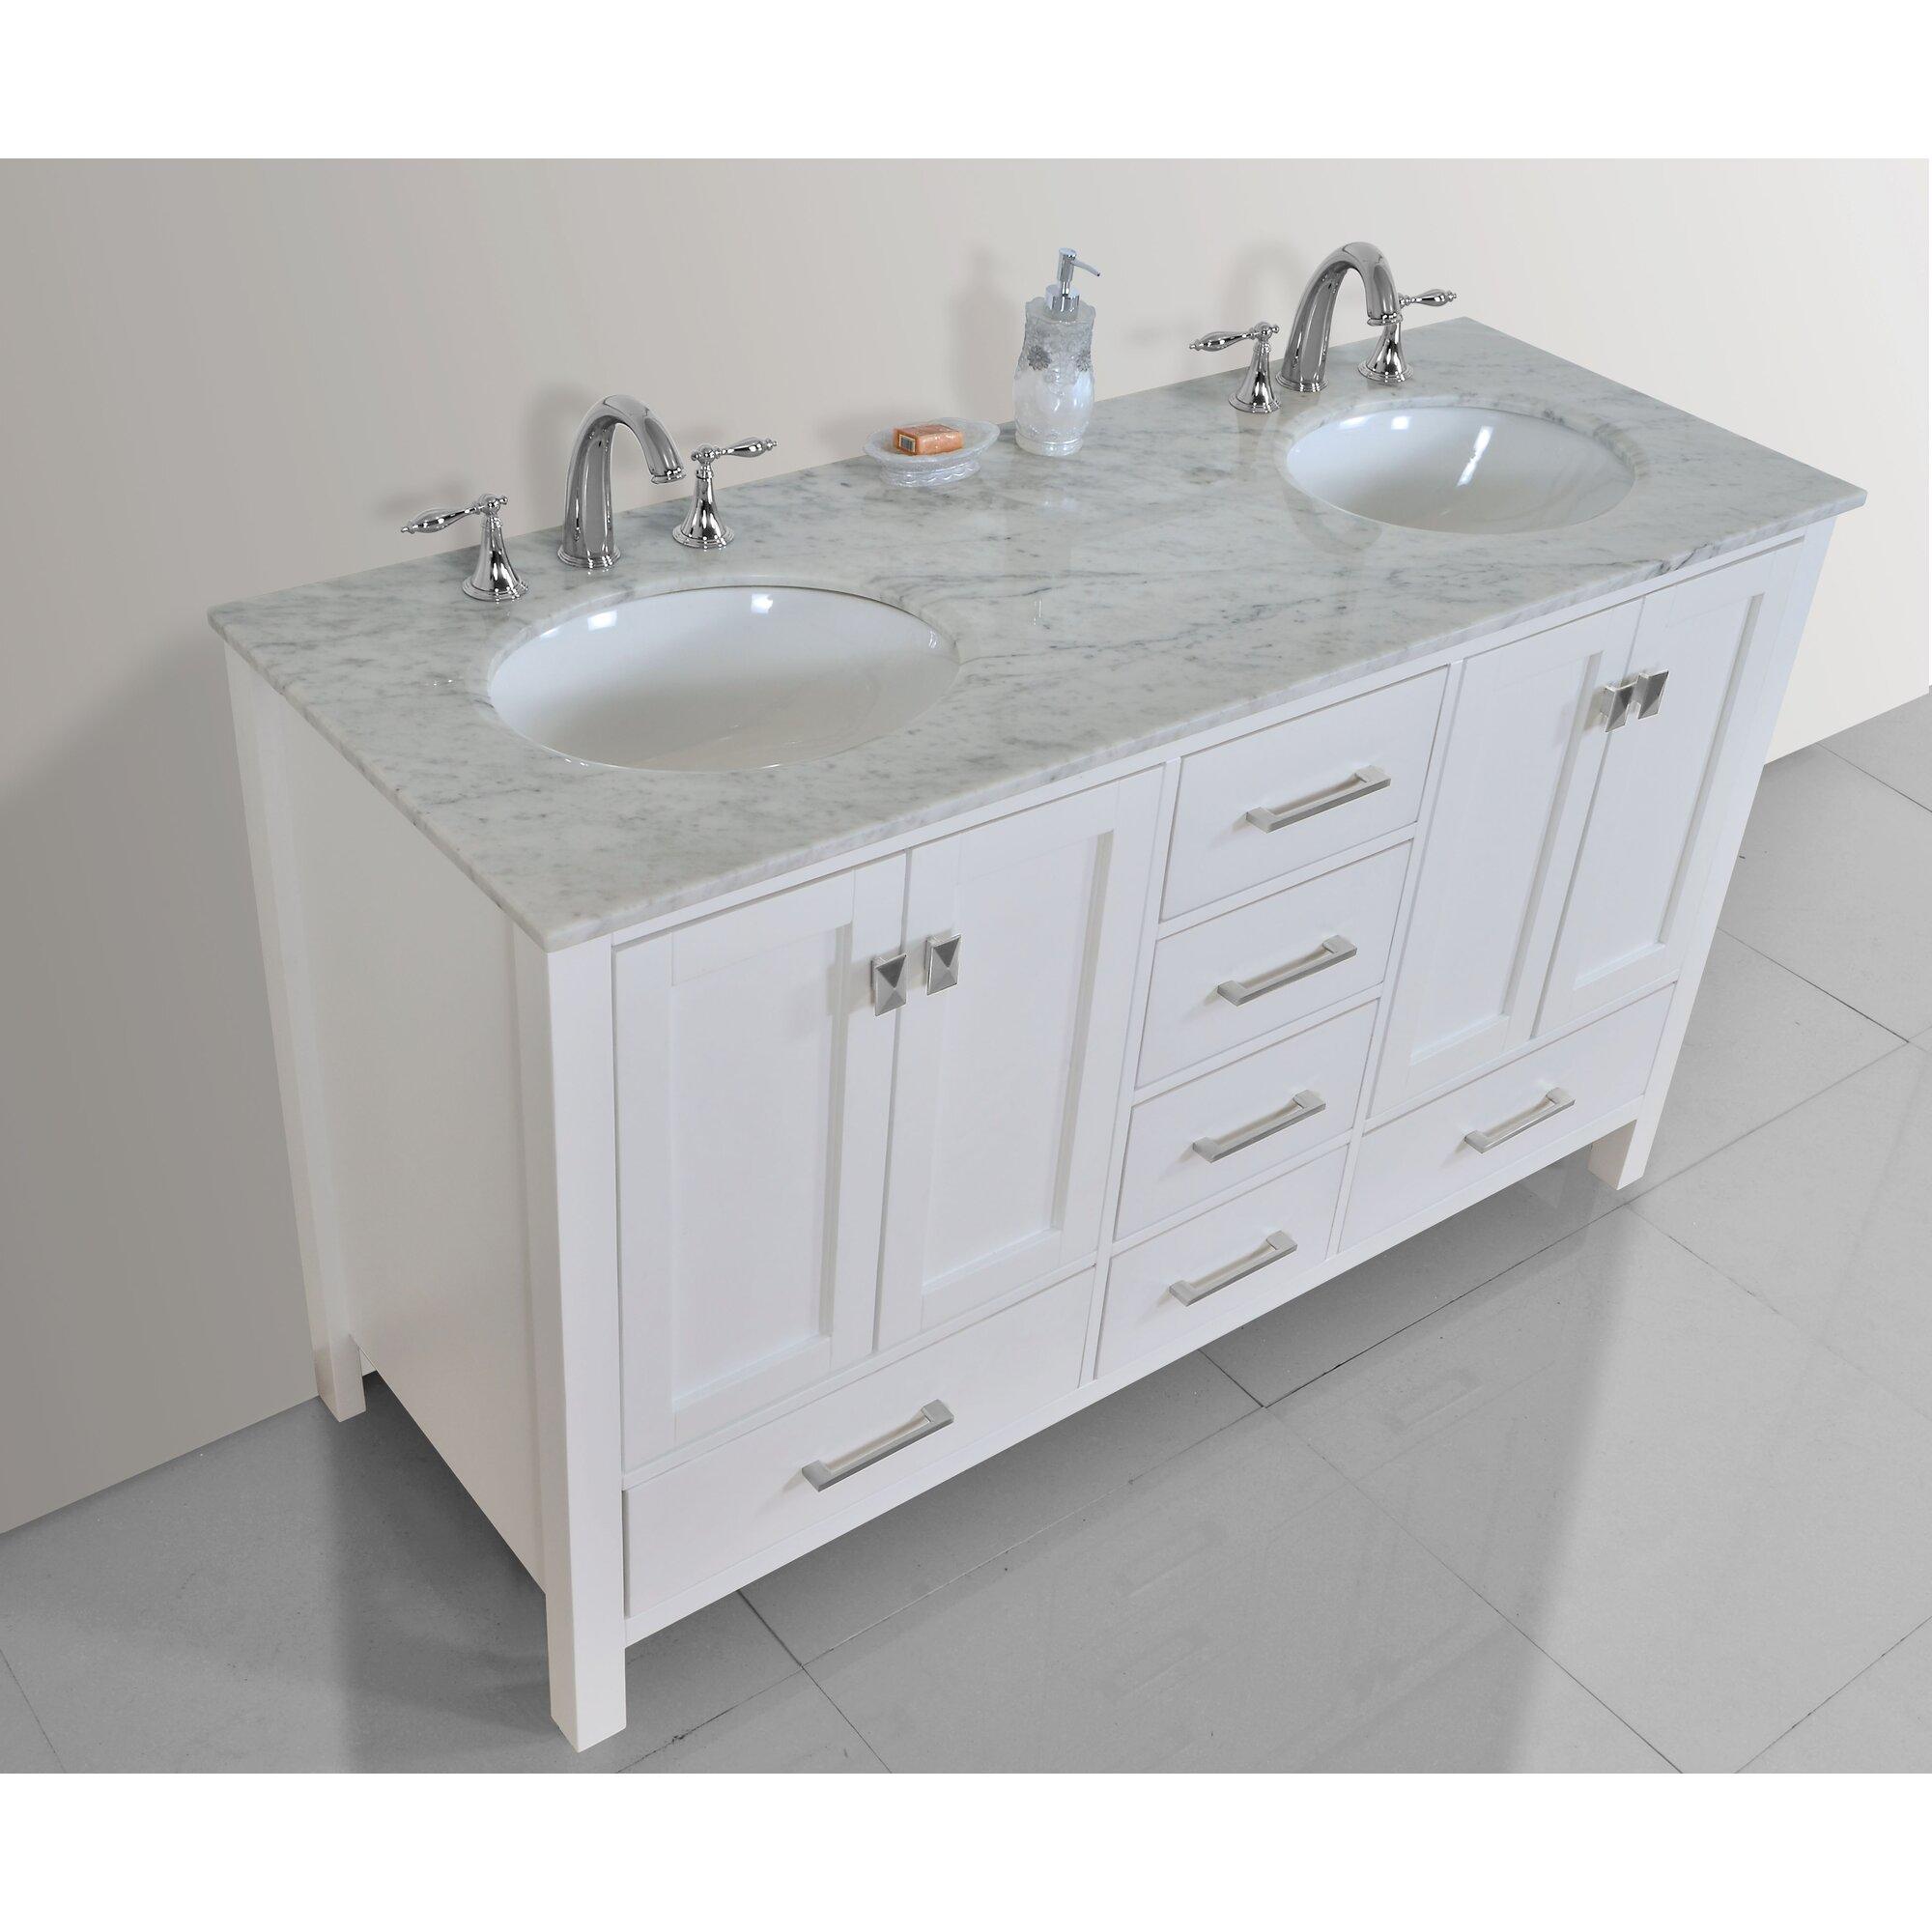 Double bathroom vanity - Ankney 60 Double Bathroom Vanity Set